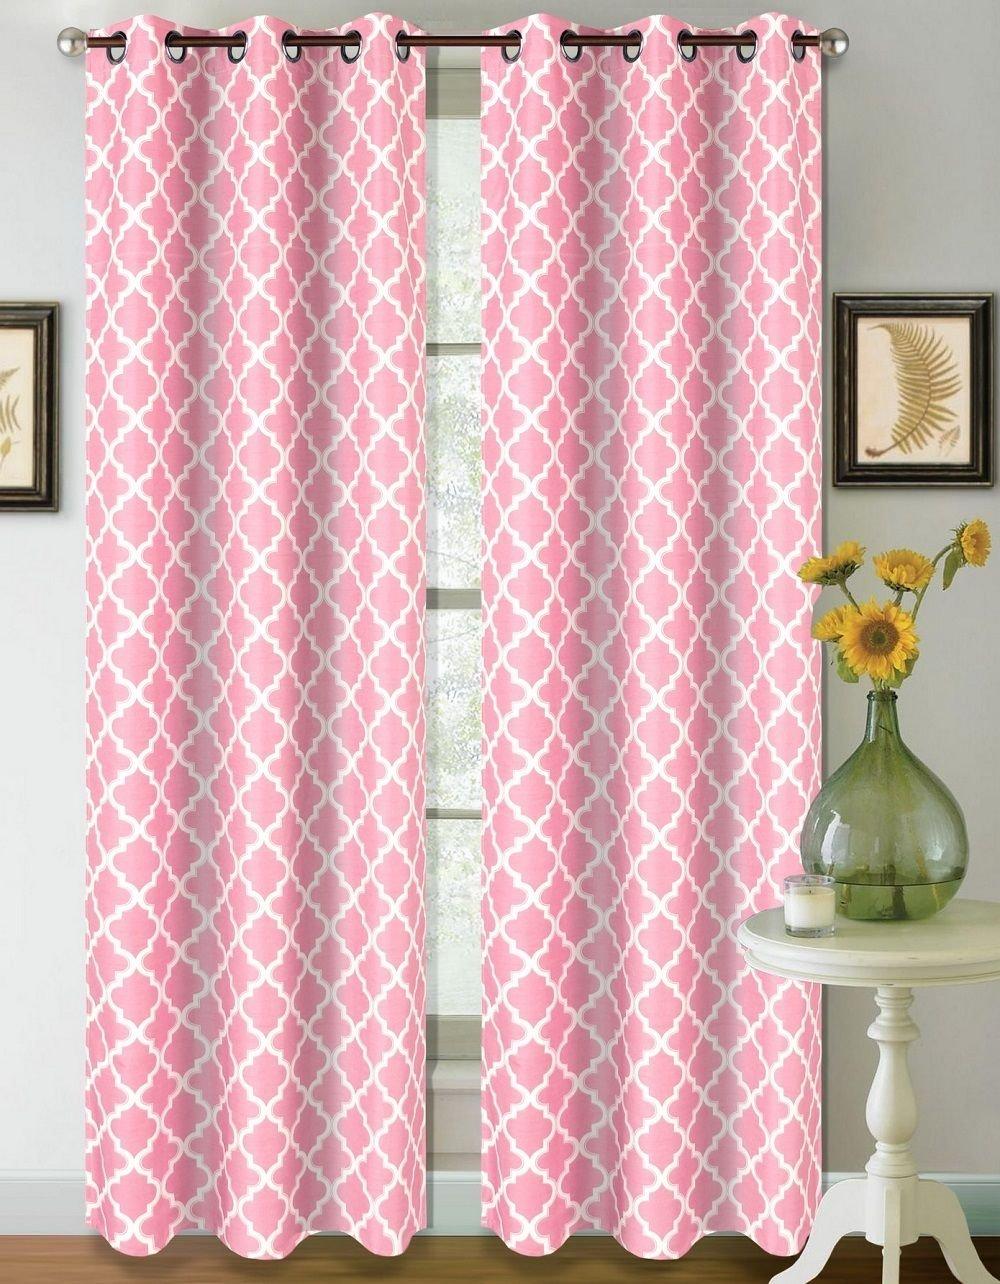 1 Set Light Pink White 108'' Geometric Lined Blackout Grommet Window Curtain